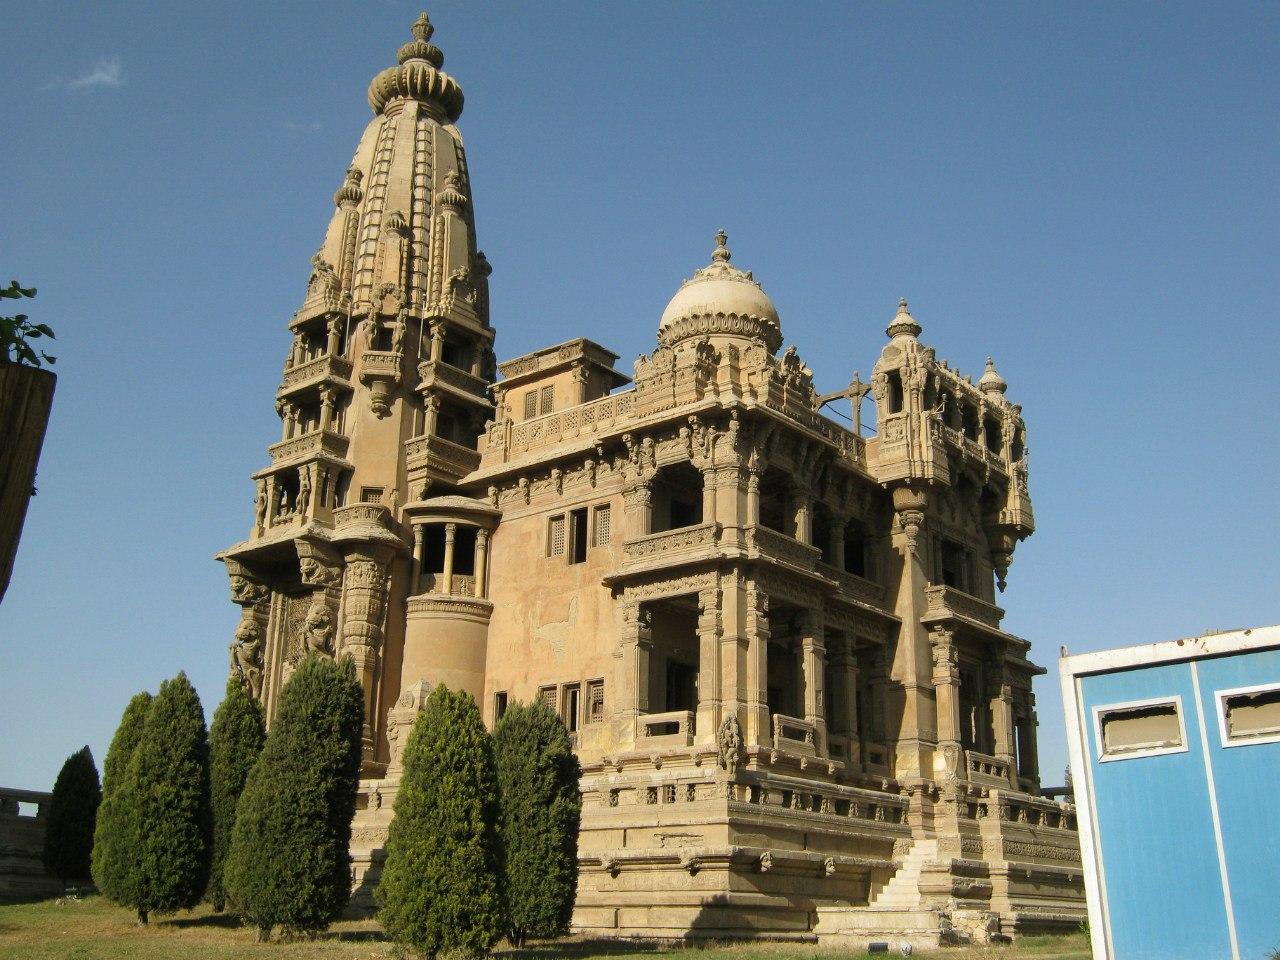 индуистский храм в Каире